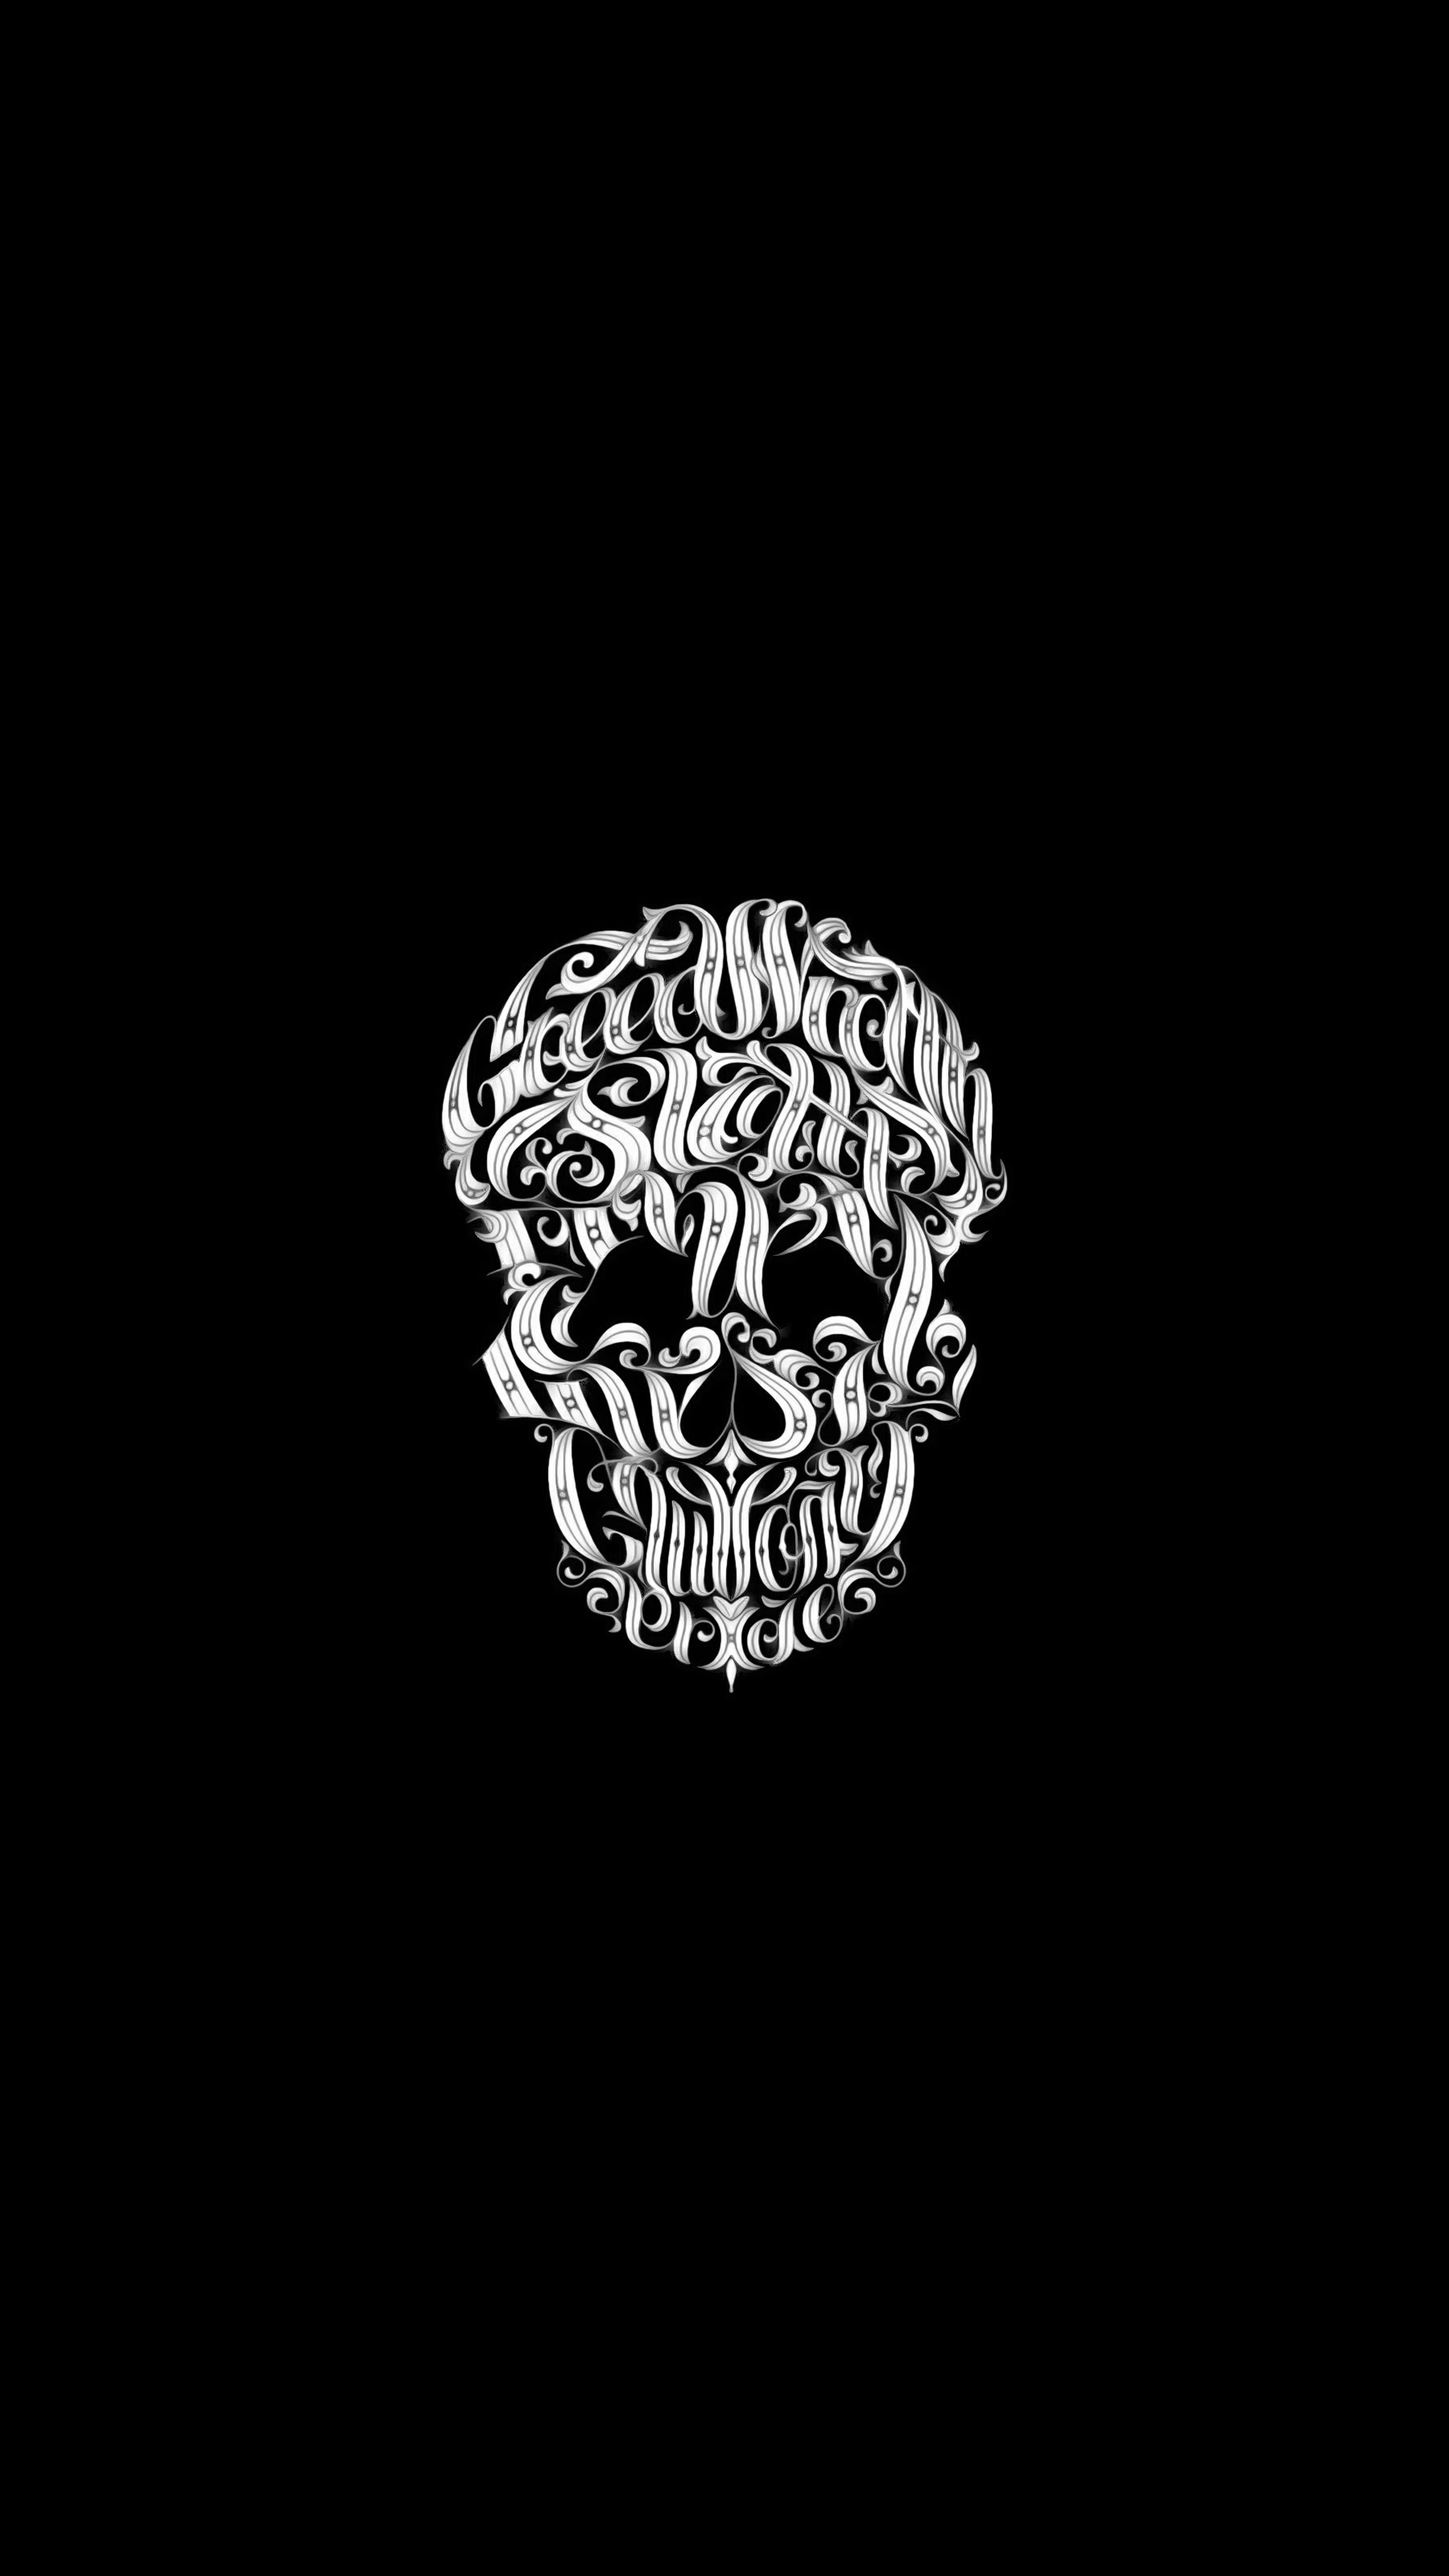 Art Skull iPhone Wallpaper